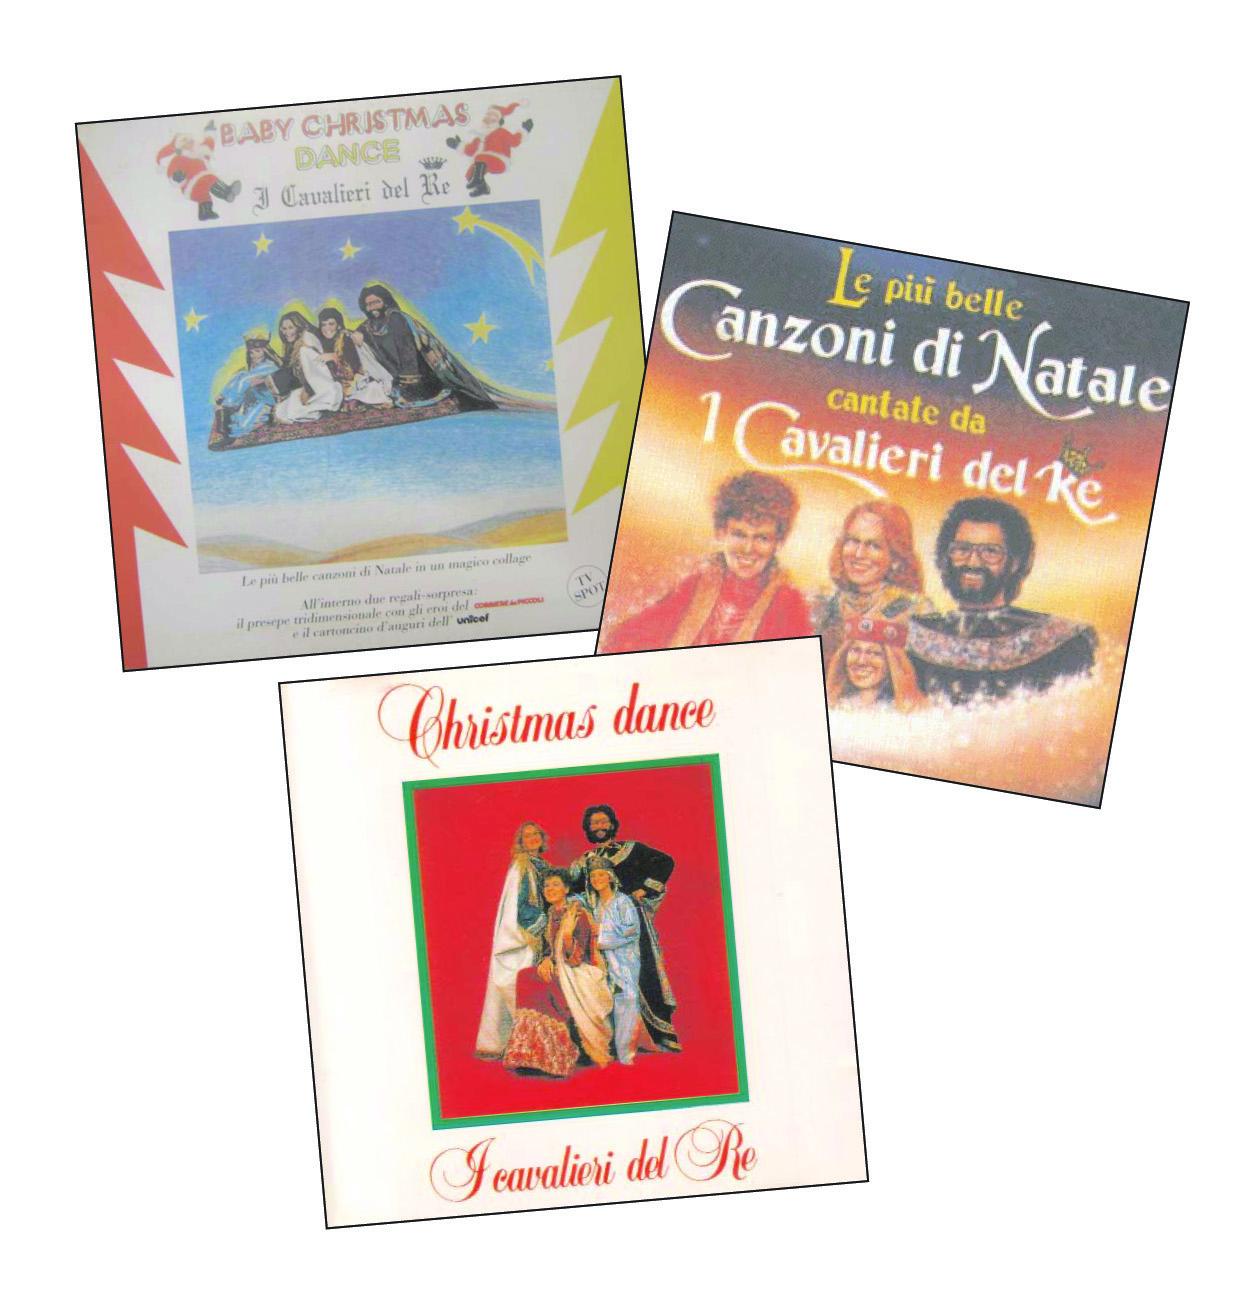 Le 14 Piu Belle Canzoni Dedicate Al Natale.Le Piu Belle Canzoni Di Natale Okay